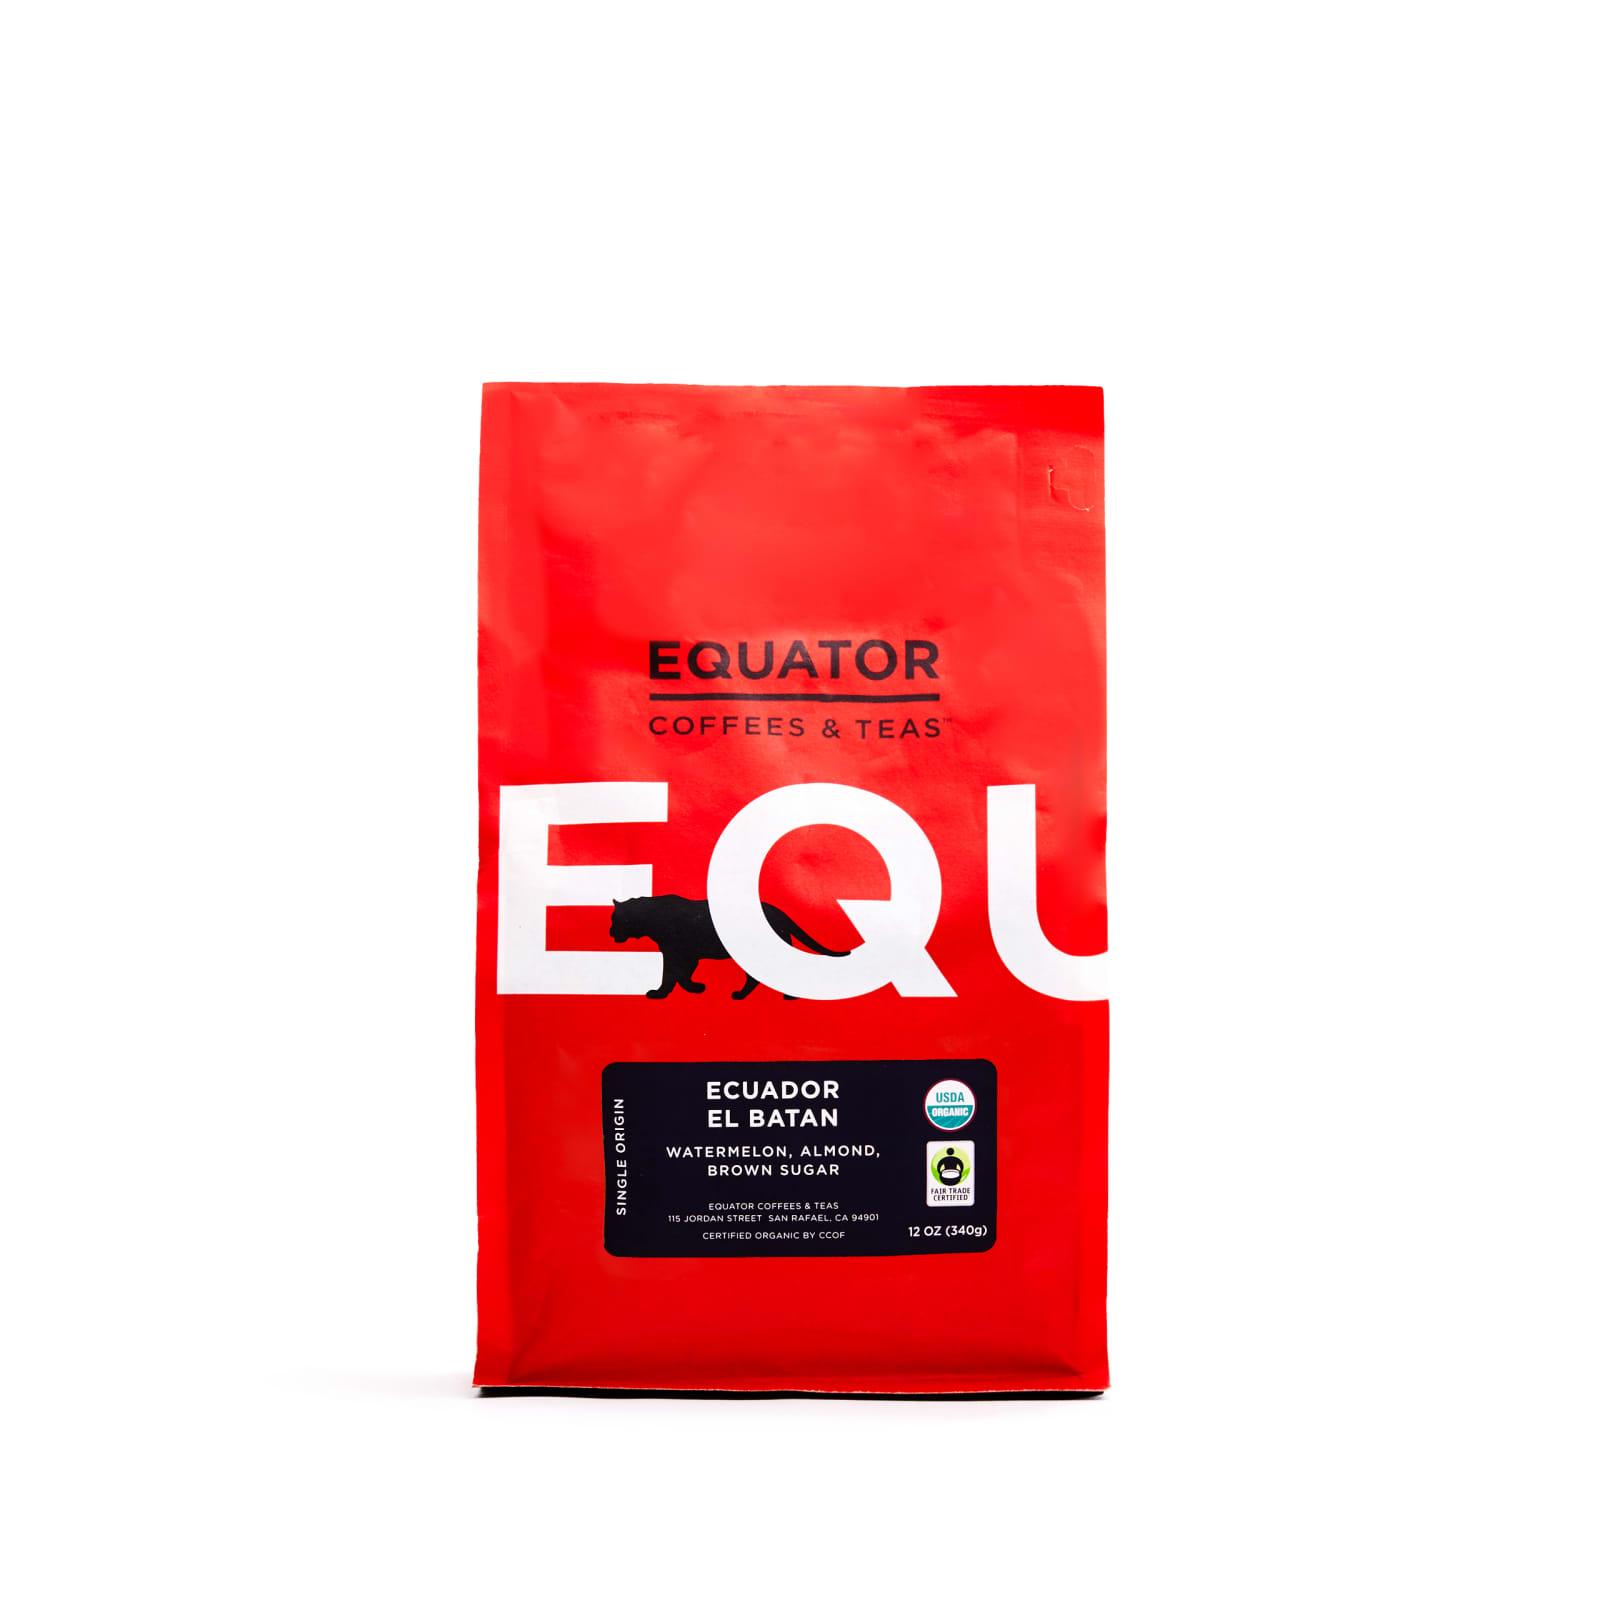 Ecuador El Batan Fair Trade Organic 2019